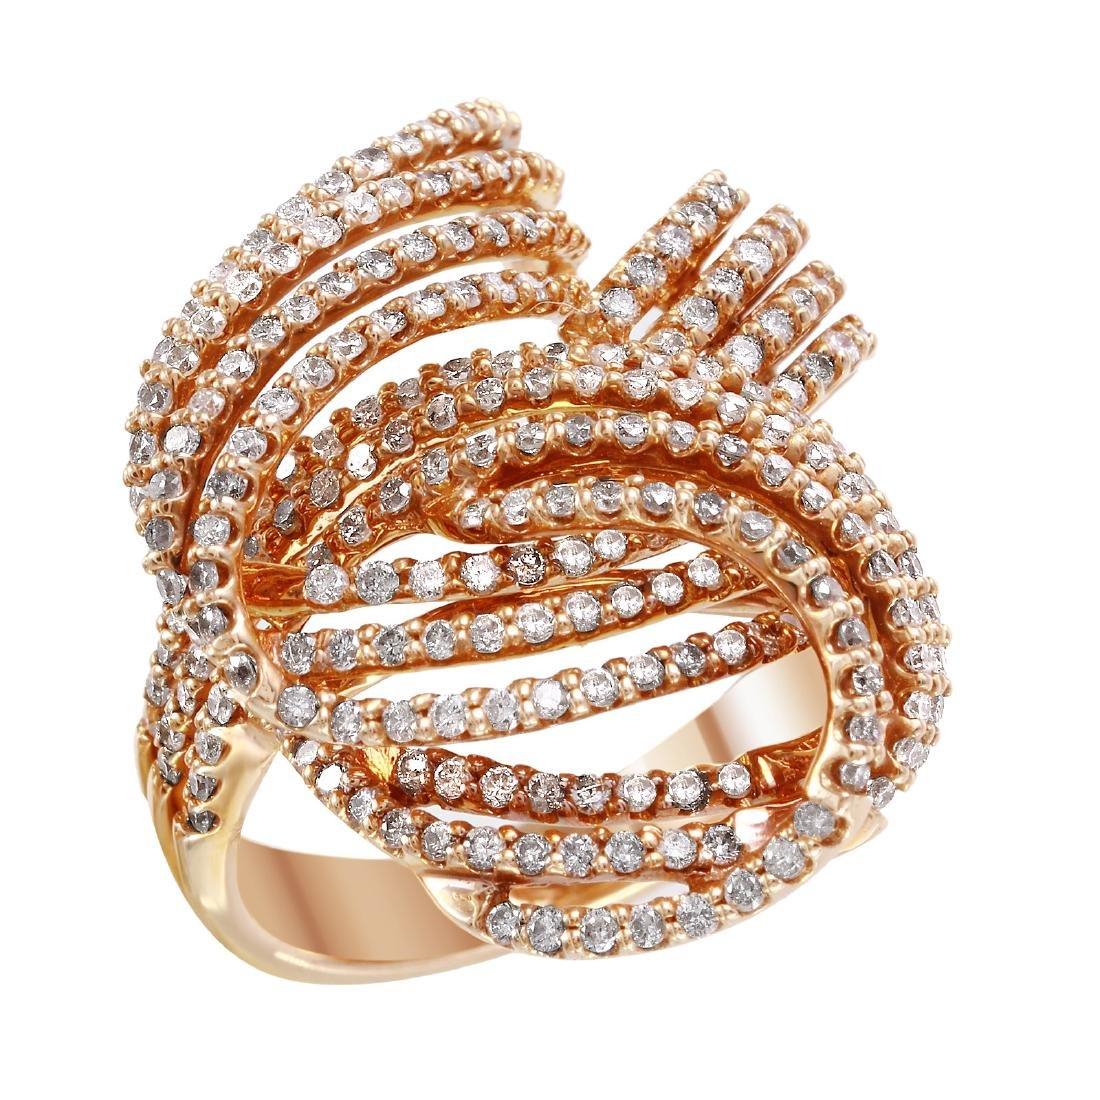 14KT Rose Gold Diamond Knot Ring